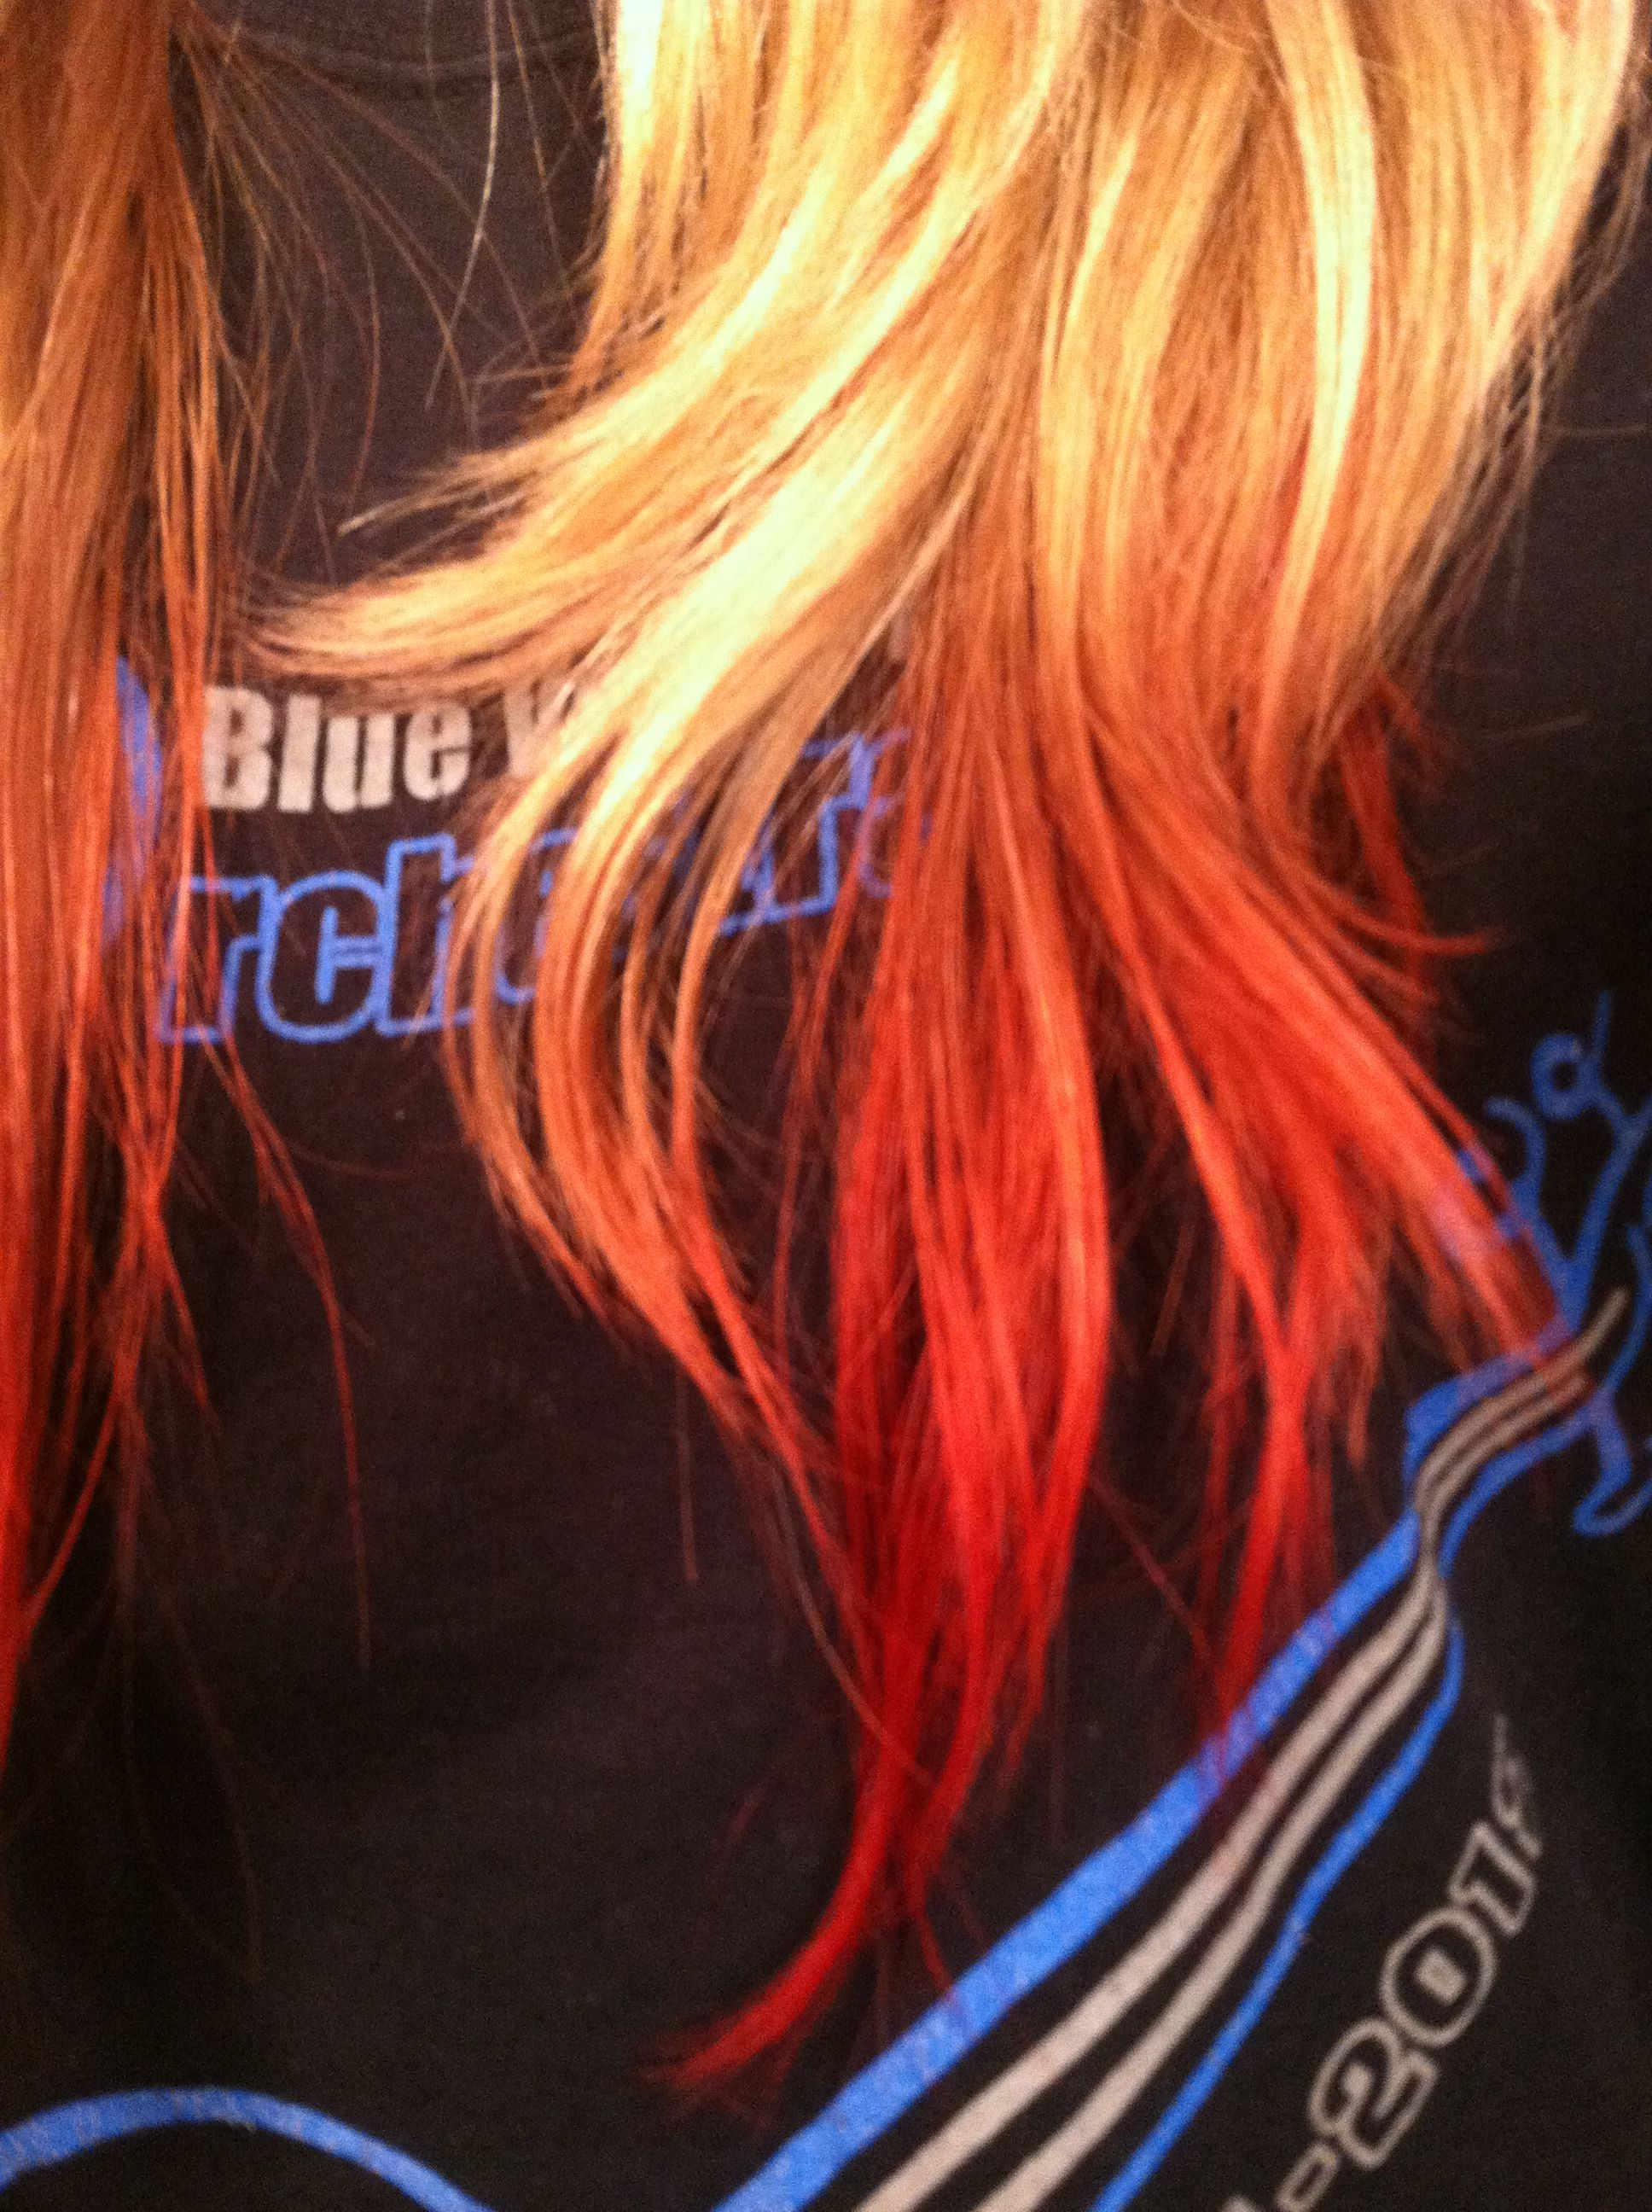 Img 9296 Jpg 1600 1600 Kool Aid Hair Kool Aid Dye Kool Aid